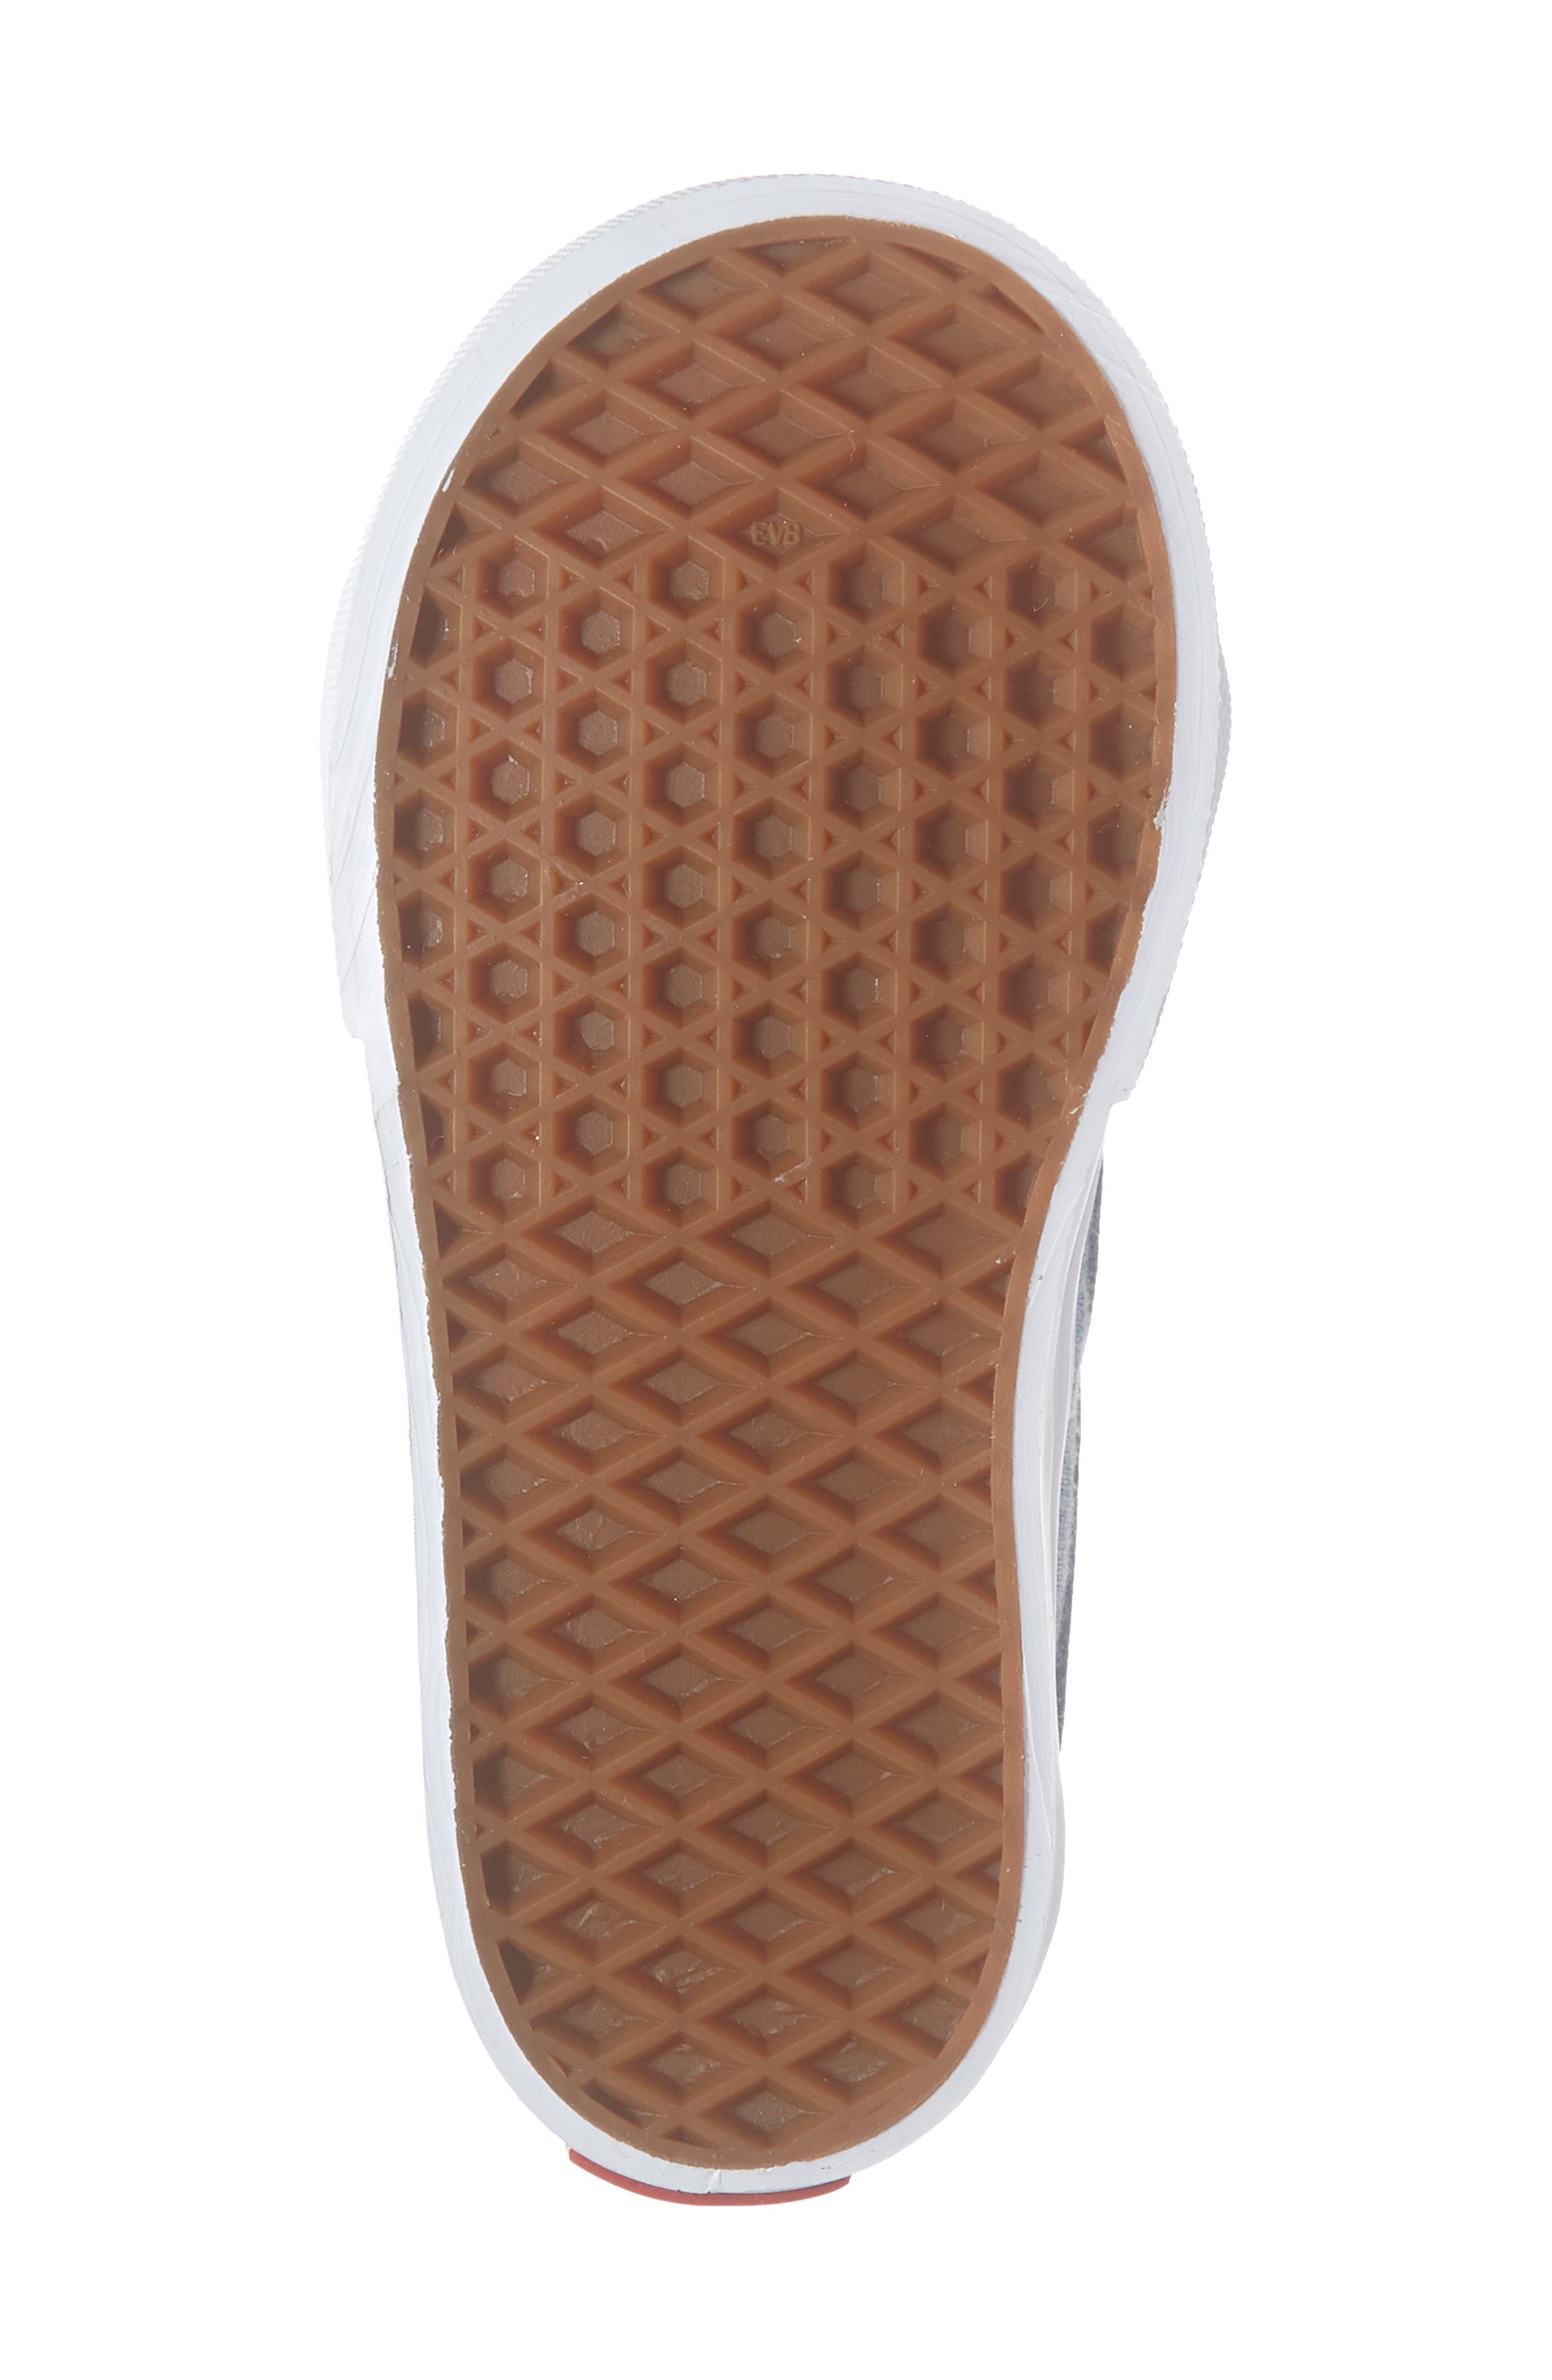 VANS, 'Sk8-Hi' Sneaker, Alternate thumbnail 6, color, CHAMBRAY CANVAS NAVY/ WHITE